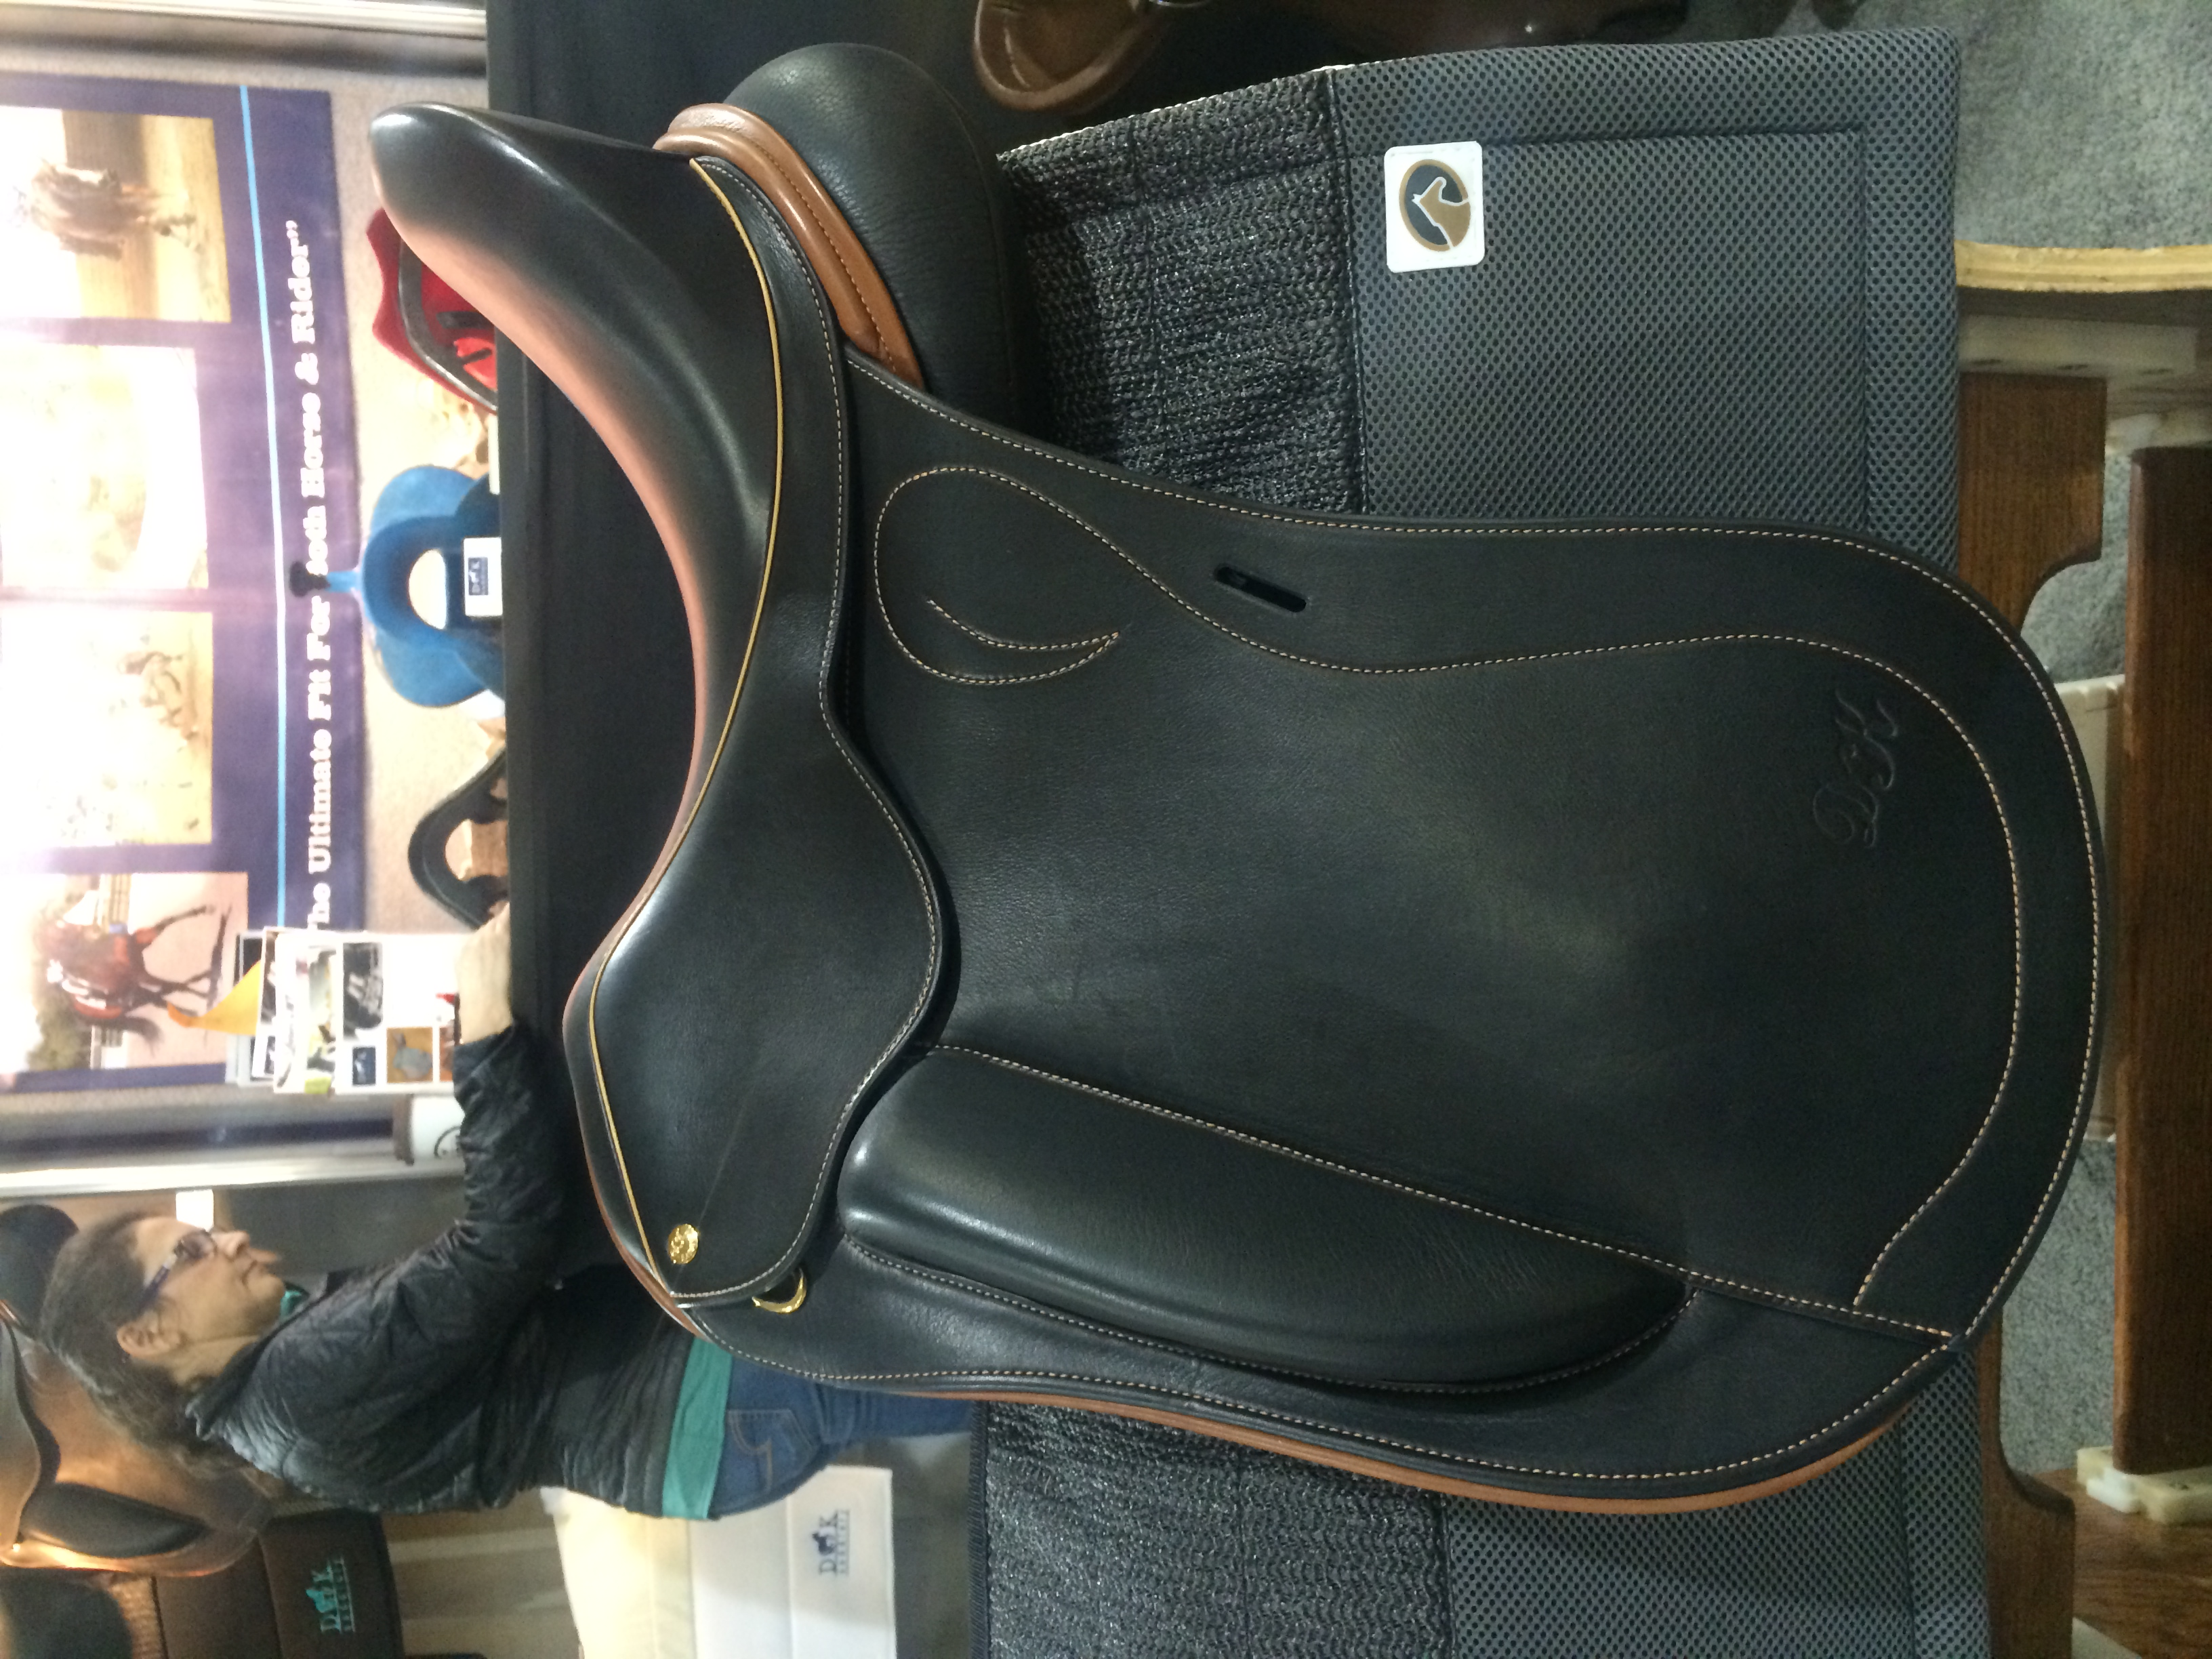 English Saddle Images | DK Home